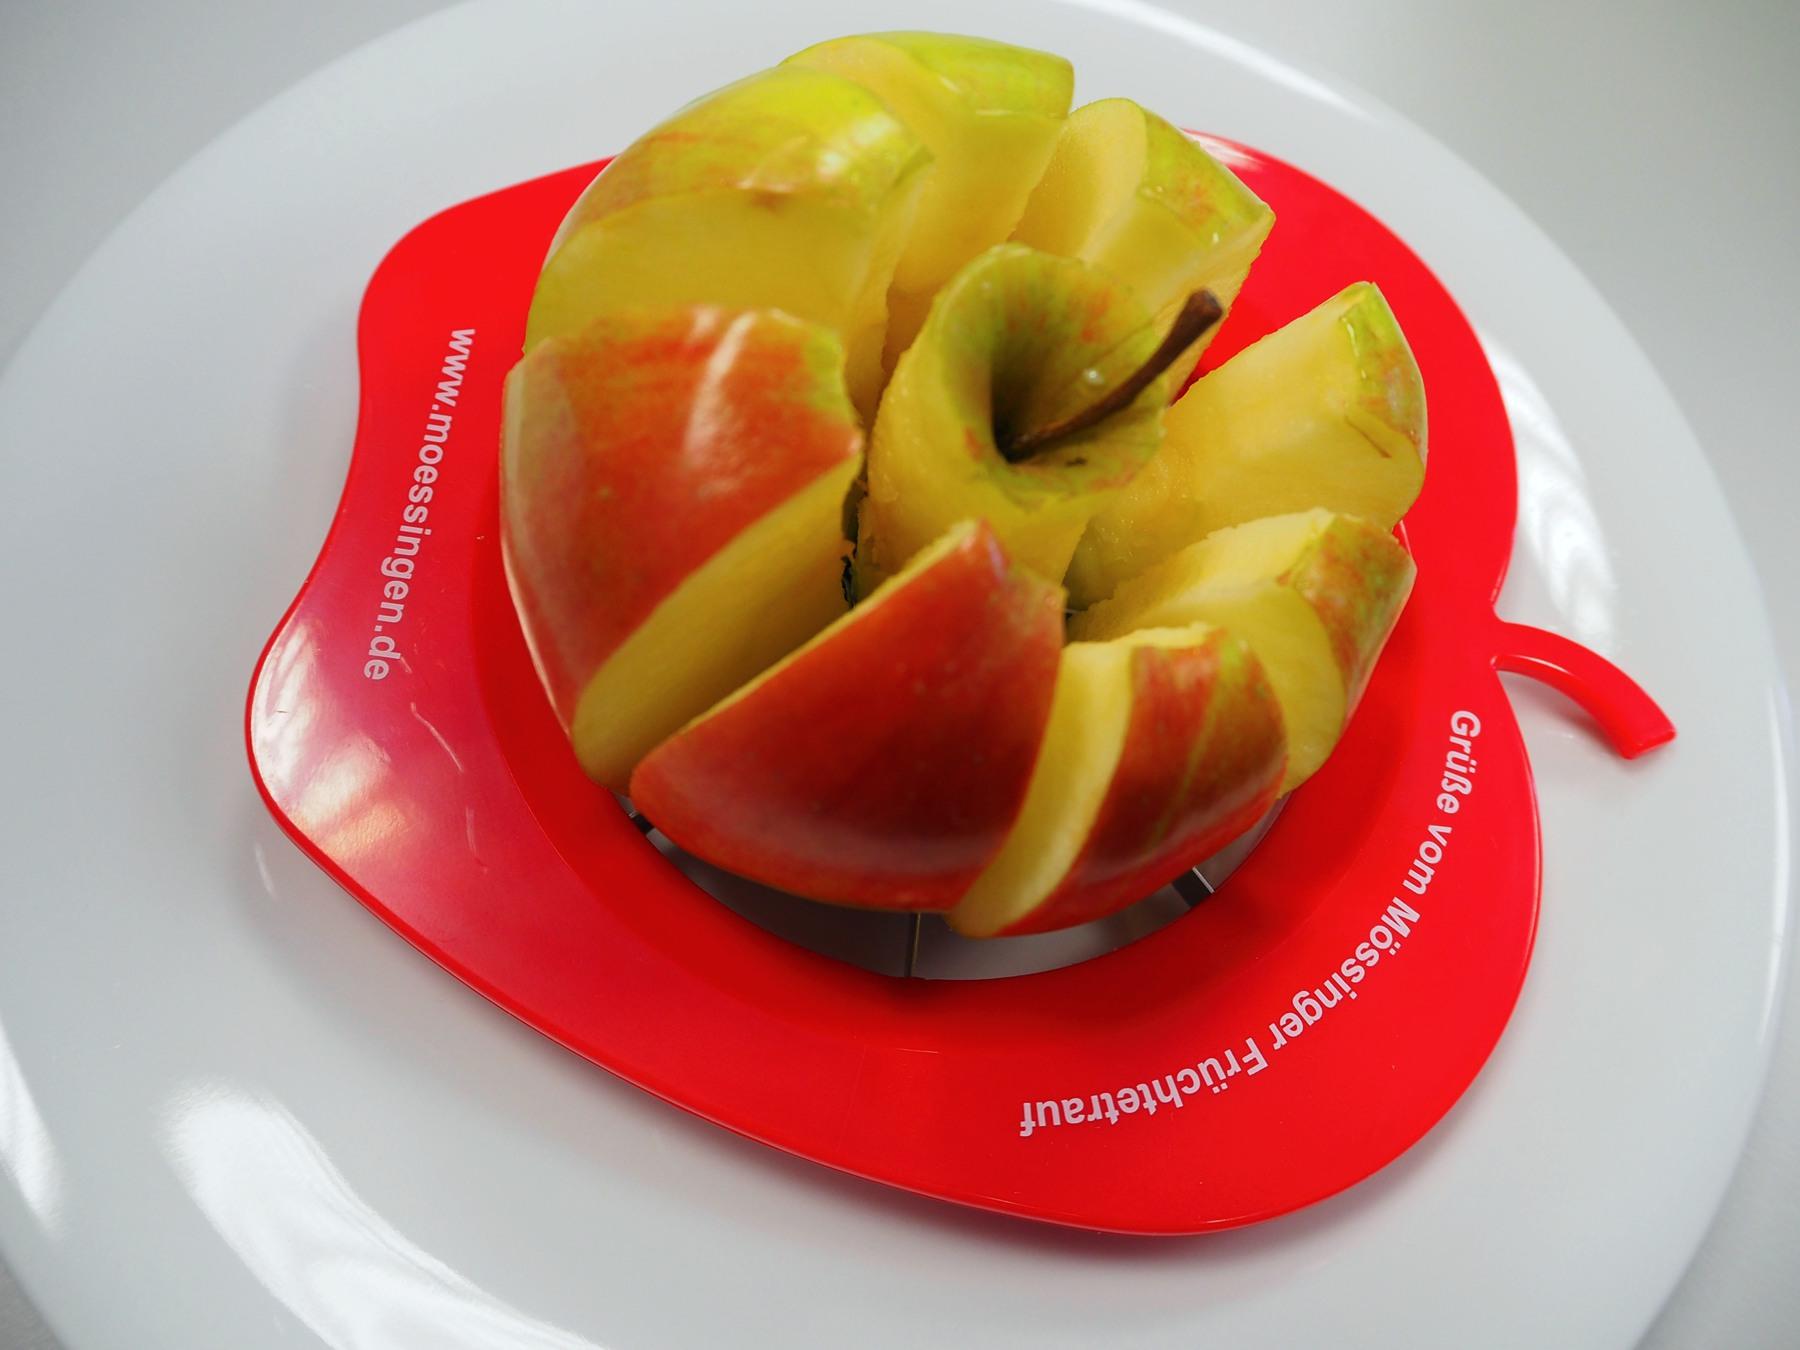 Mössinger Apfelteiler